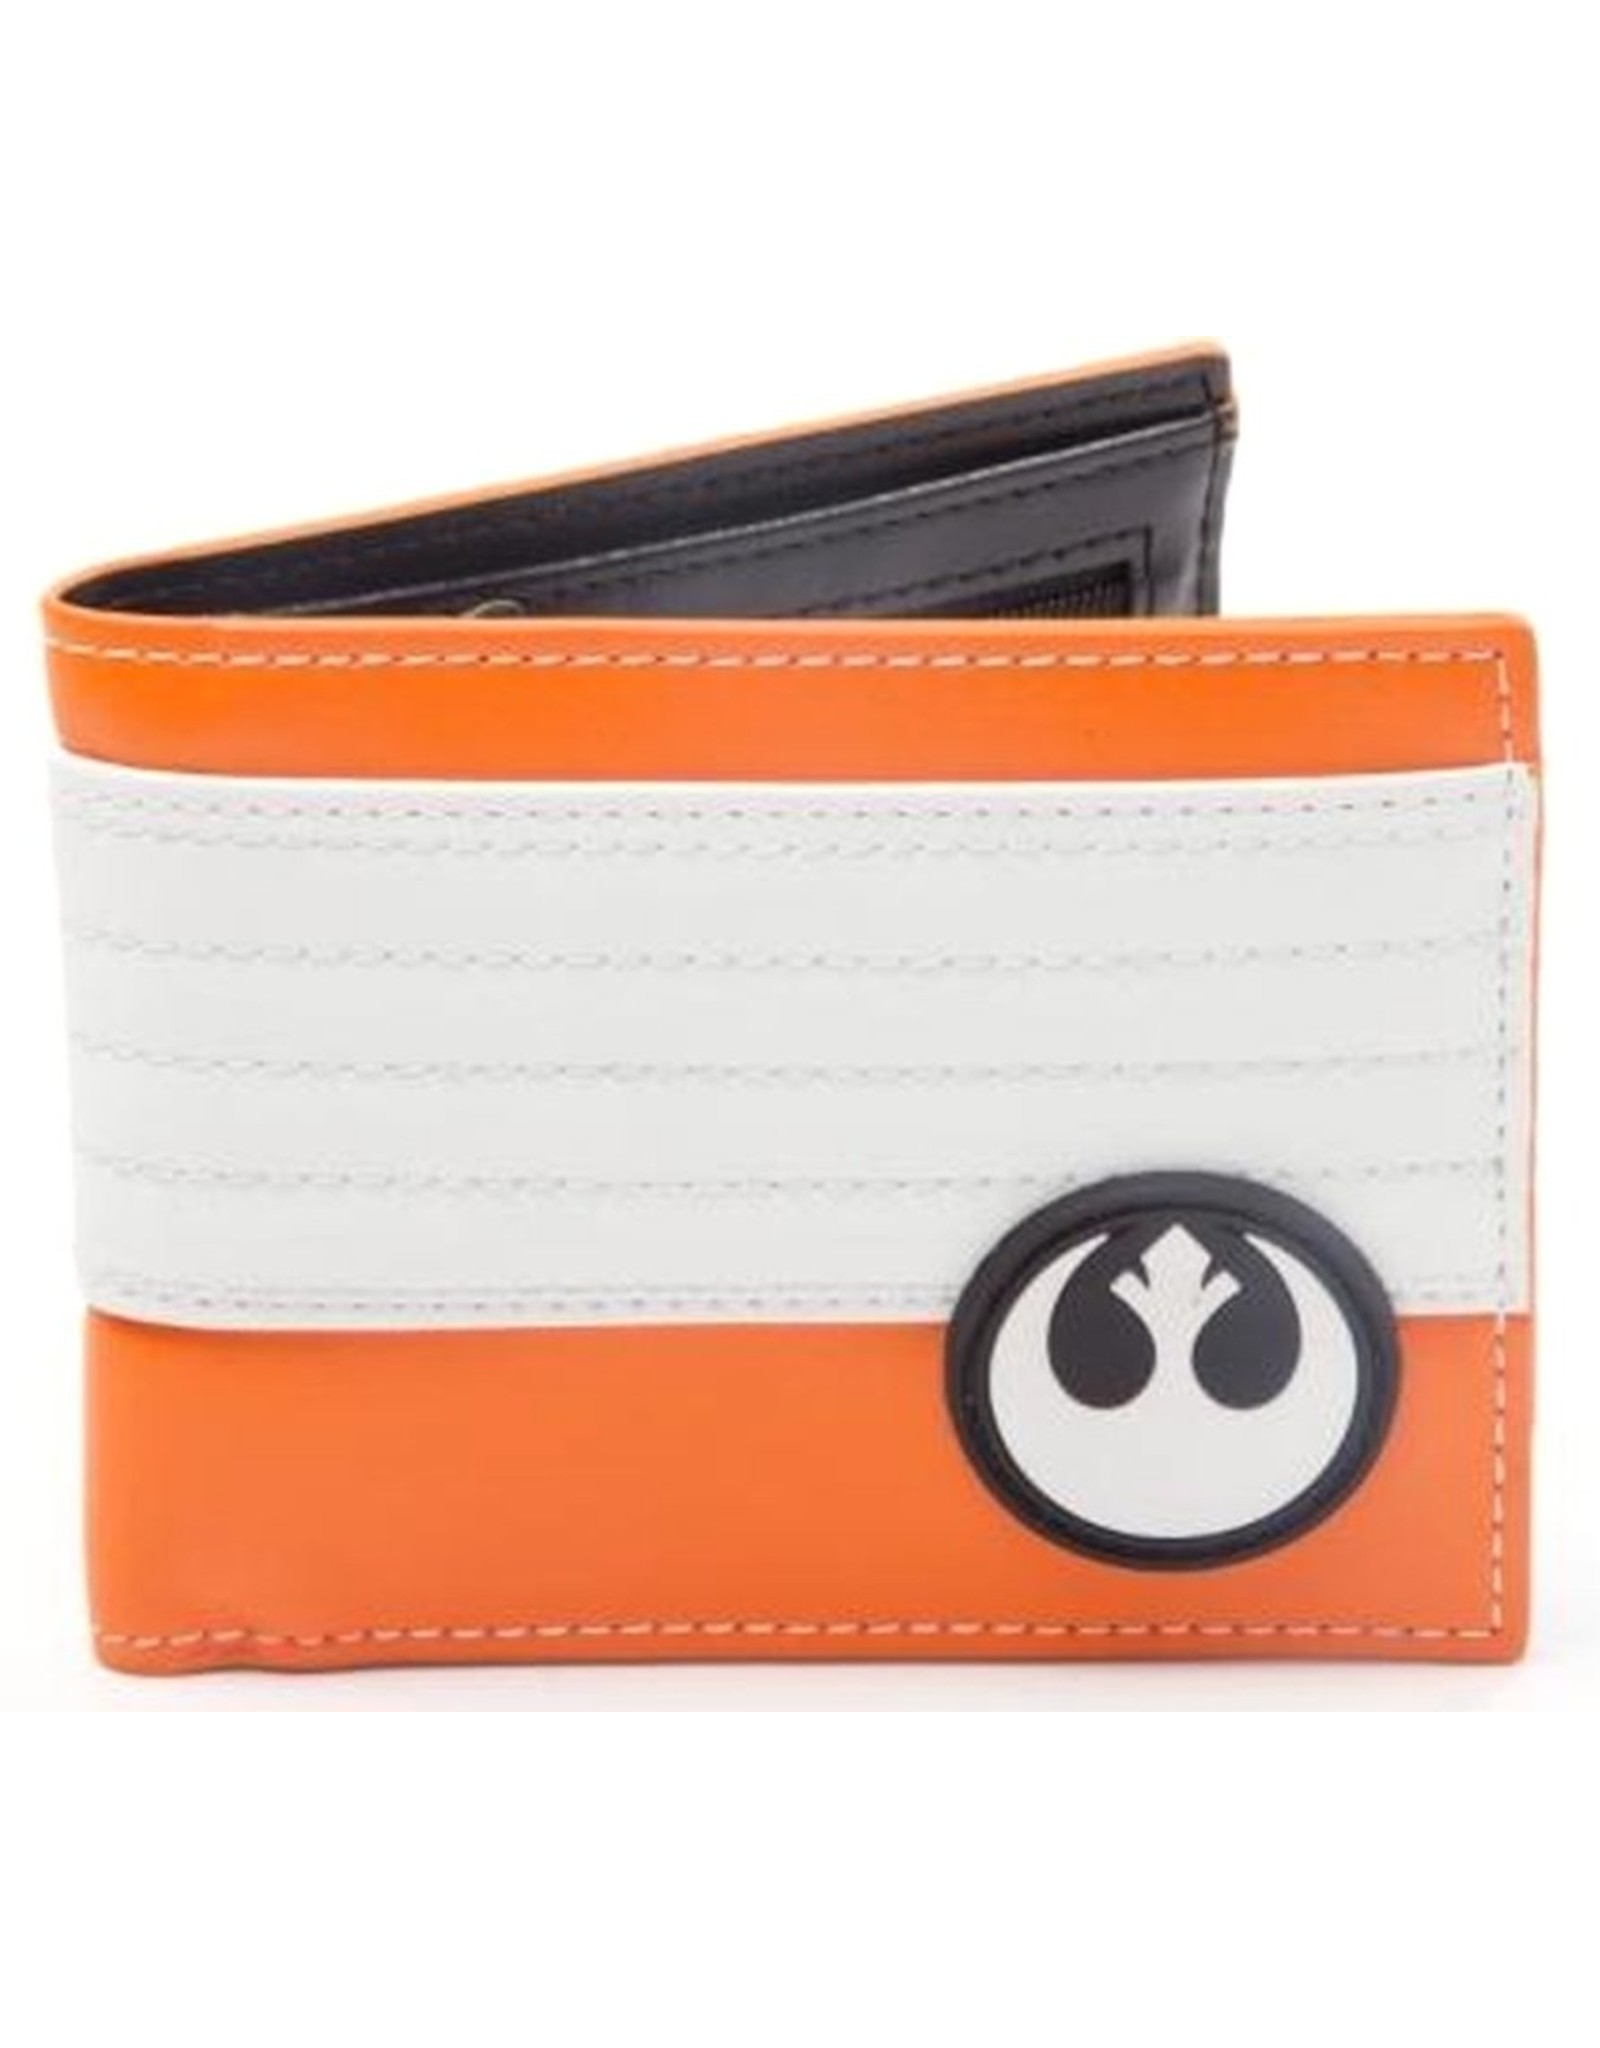 Star Wars Merchandise portemonnees - Star Wars The Force Awakens - The Resistance portemonnee